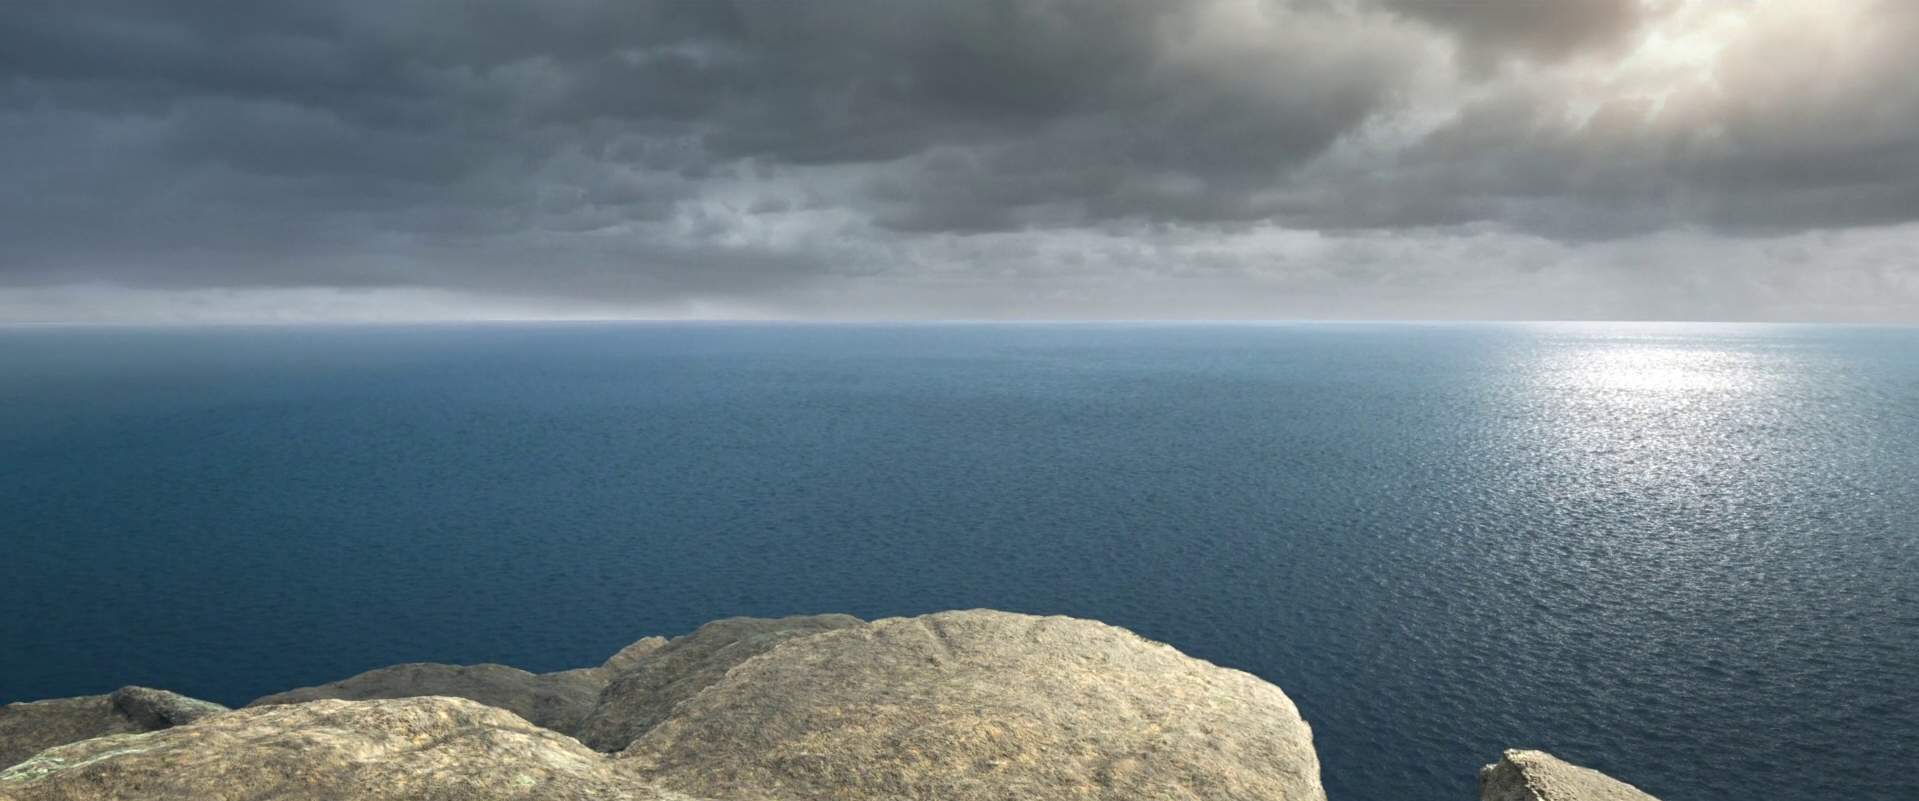 Lalotai Ocean View (Moana - 2016).png